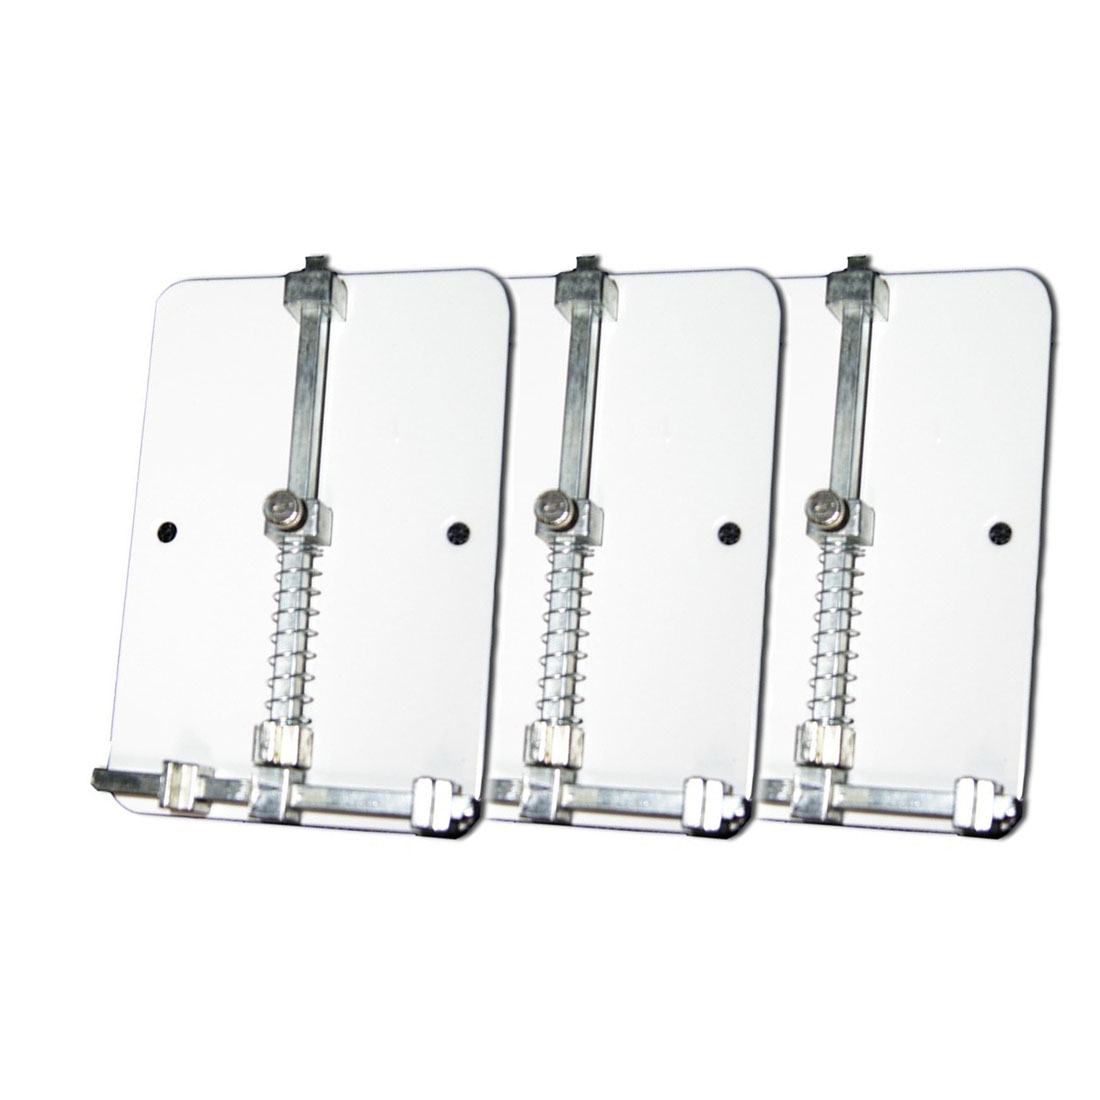 Купить с кэшбэком Hot 1pc High Quality 8*12cm Fixture Motherboard PCB Holder For Mobile Phone Board Repair Tool